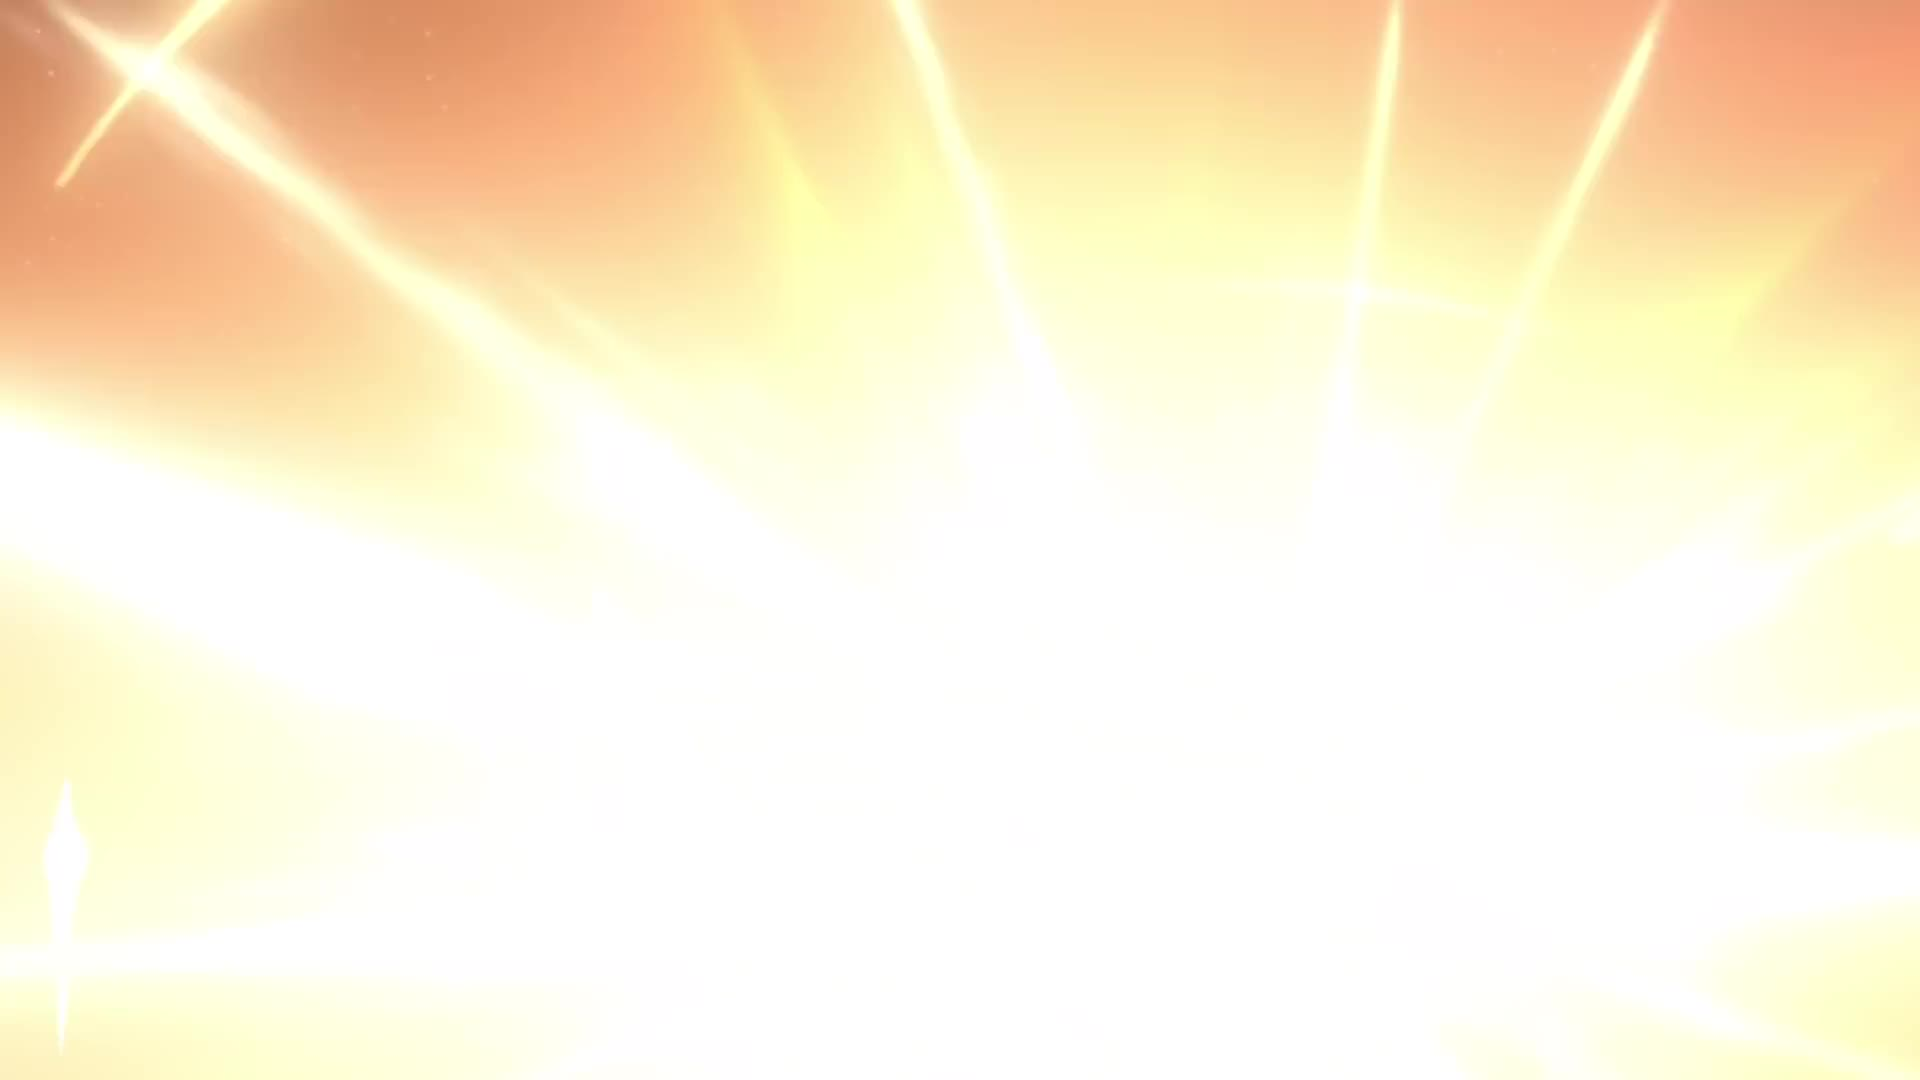 Star Wars Resistance (Season 2) - Official Trailer [HD] screen capture